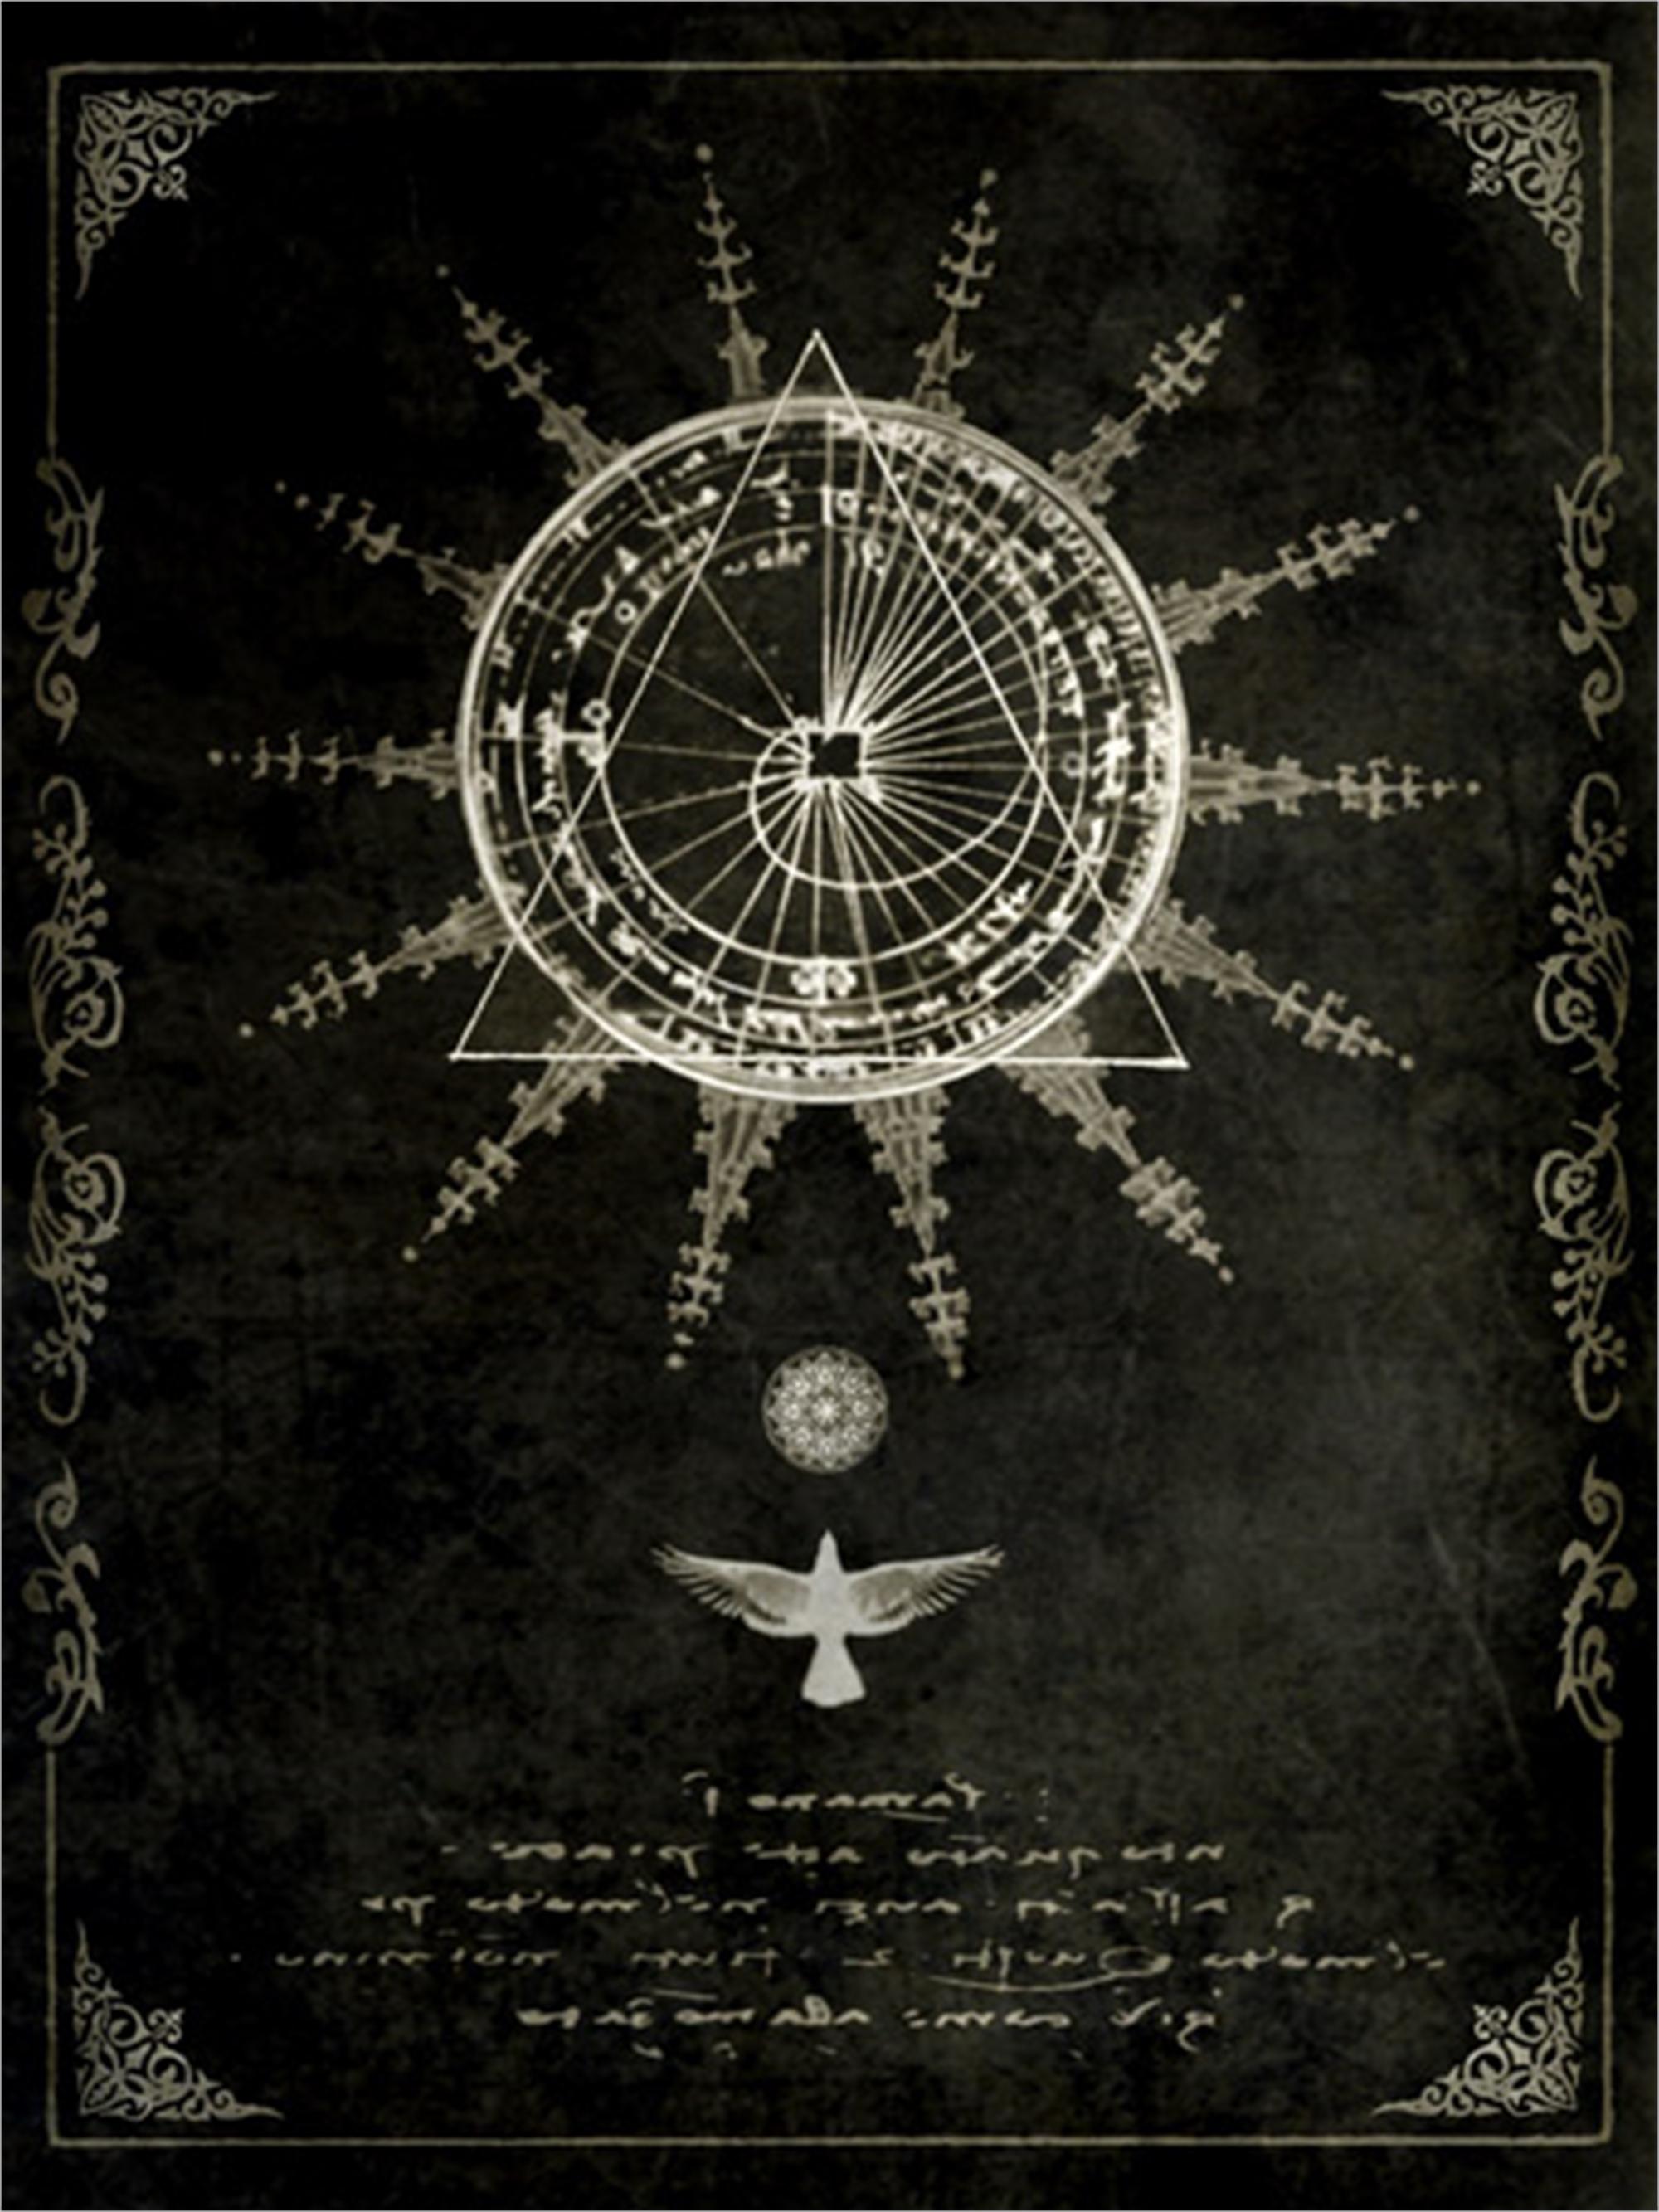 Book of the Sun (akashic records) by Yuko Ishii